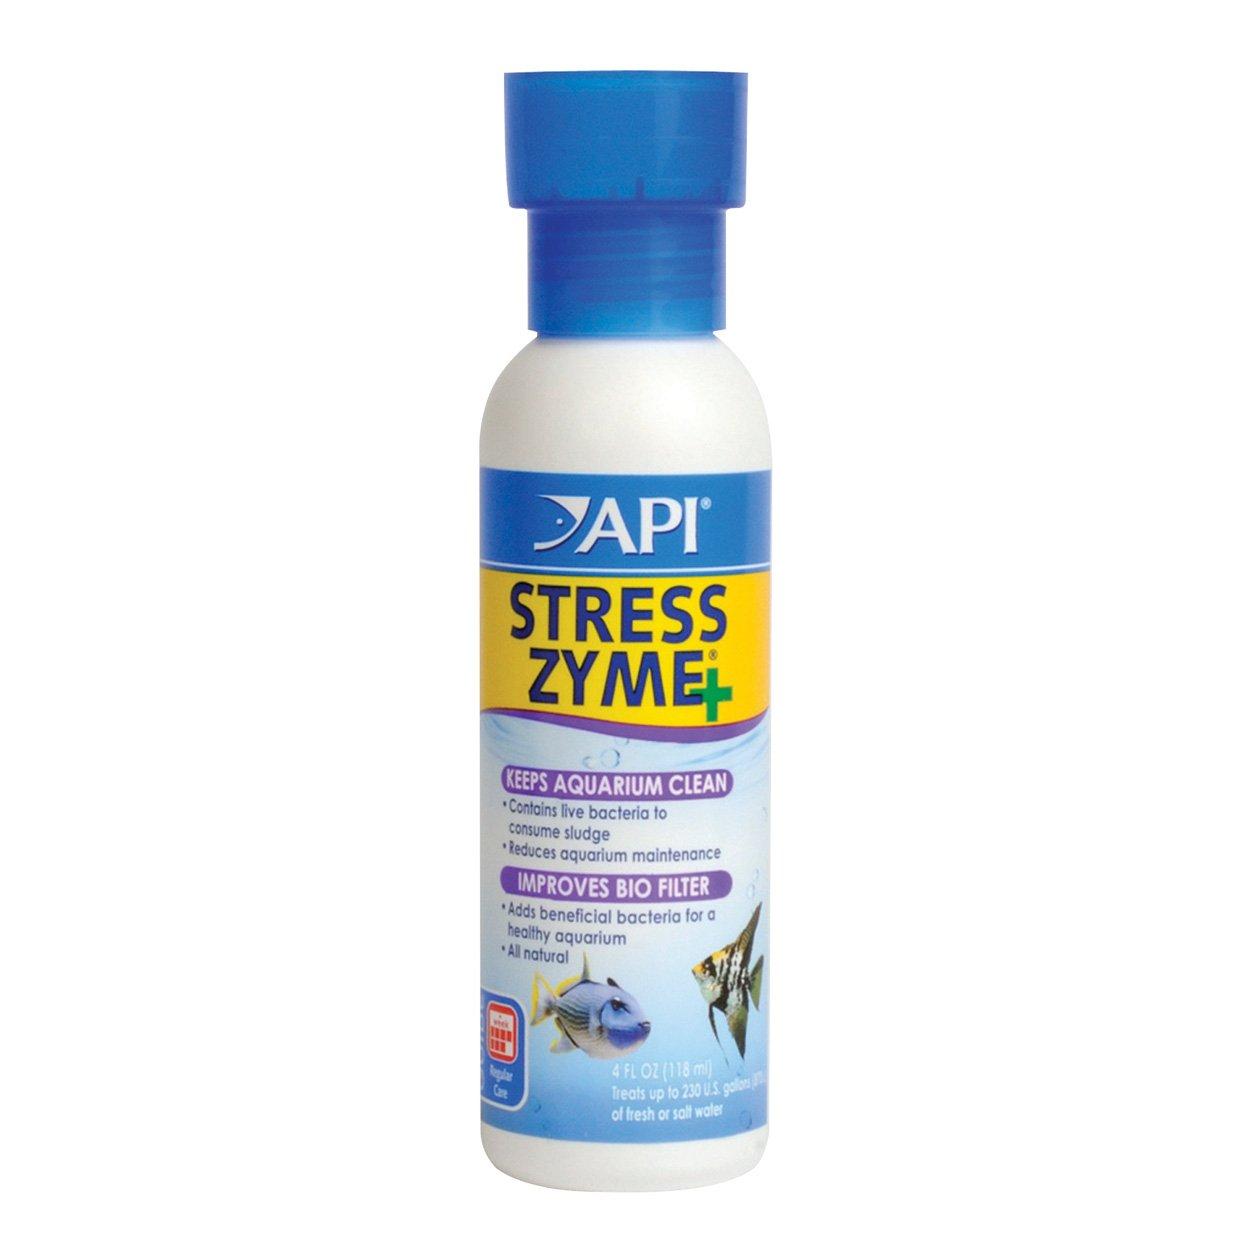 API 2343 Stress Zyme+ Thermometers by API